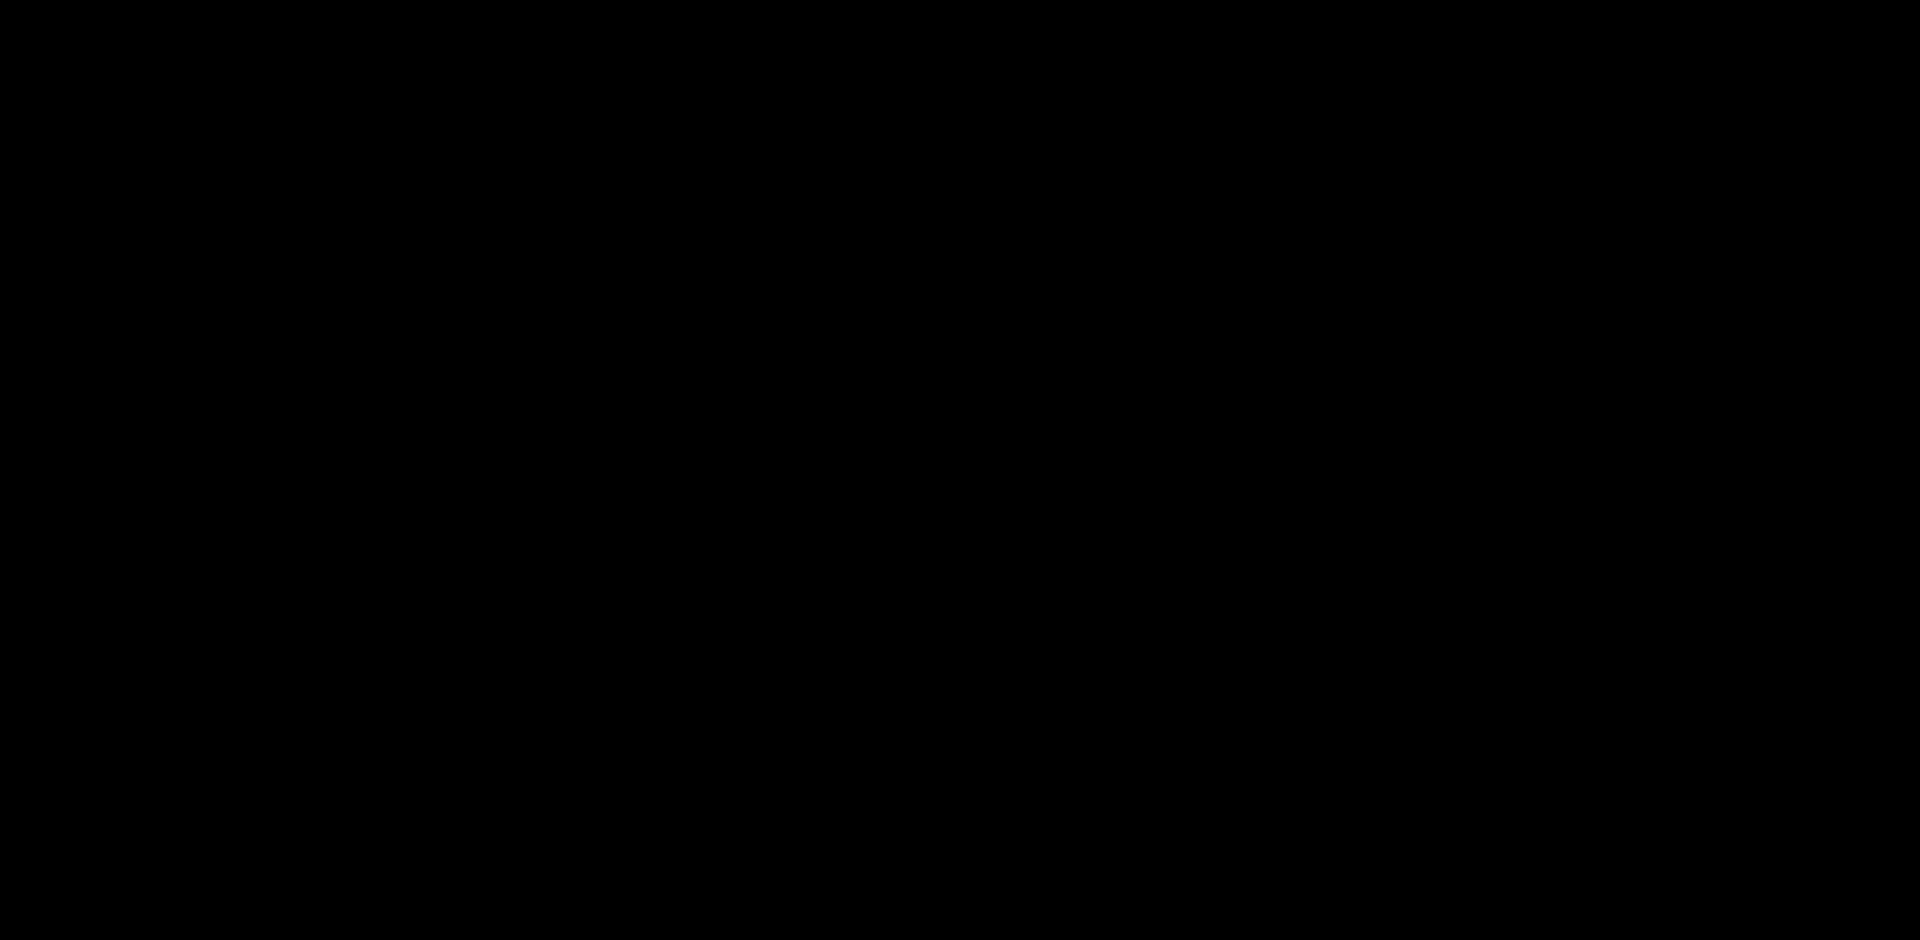 ARGOS_Amb02_WHITE_WEB.jpg